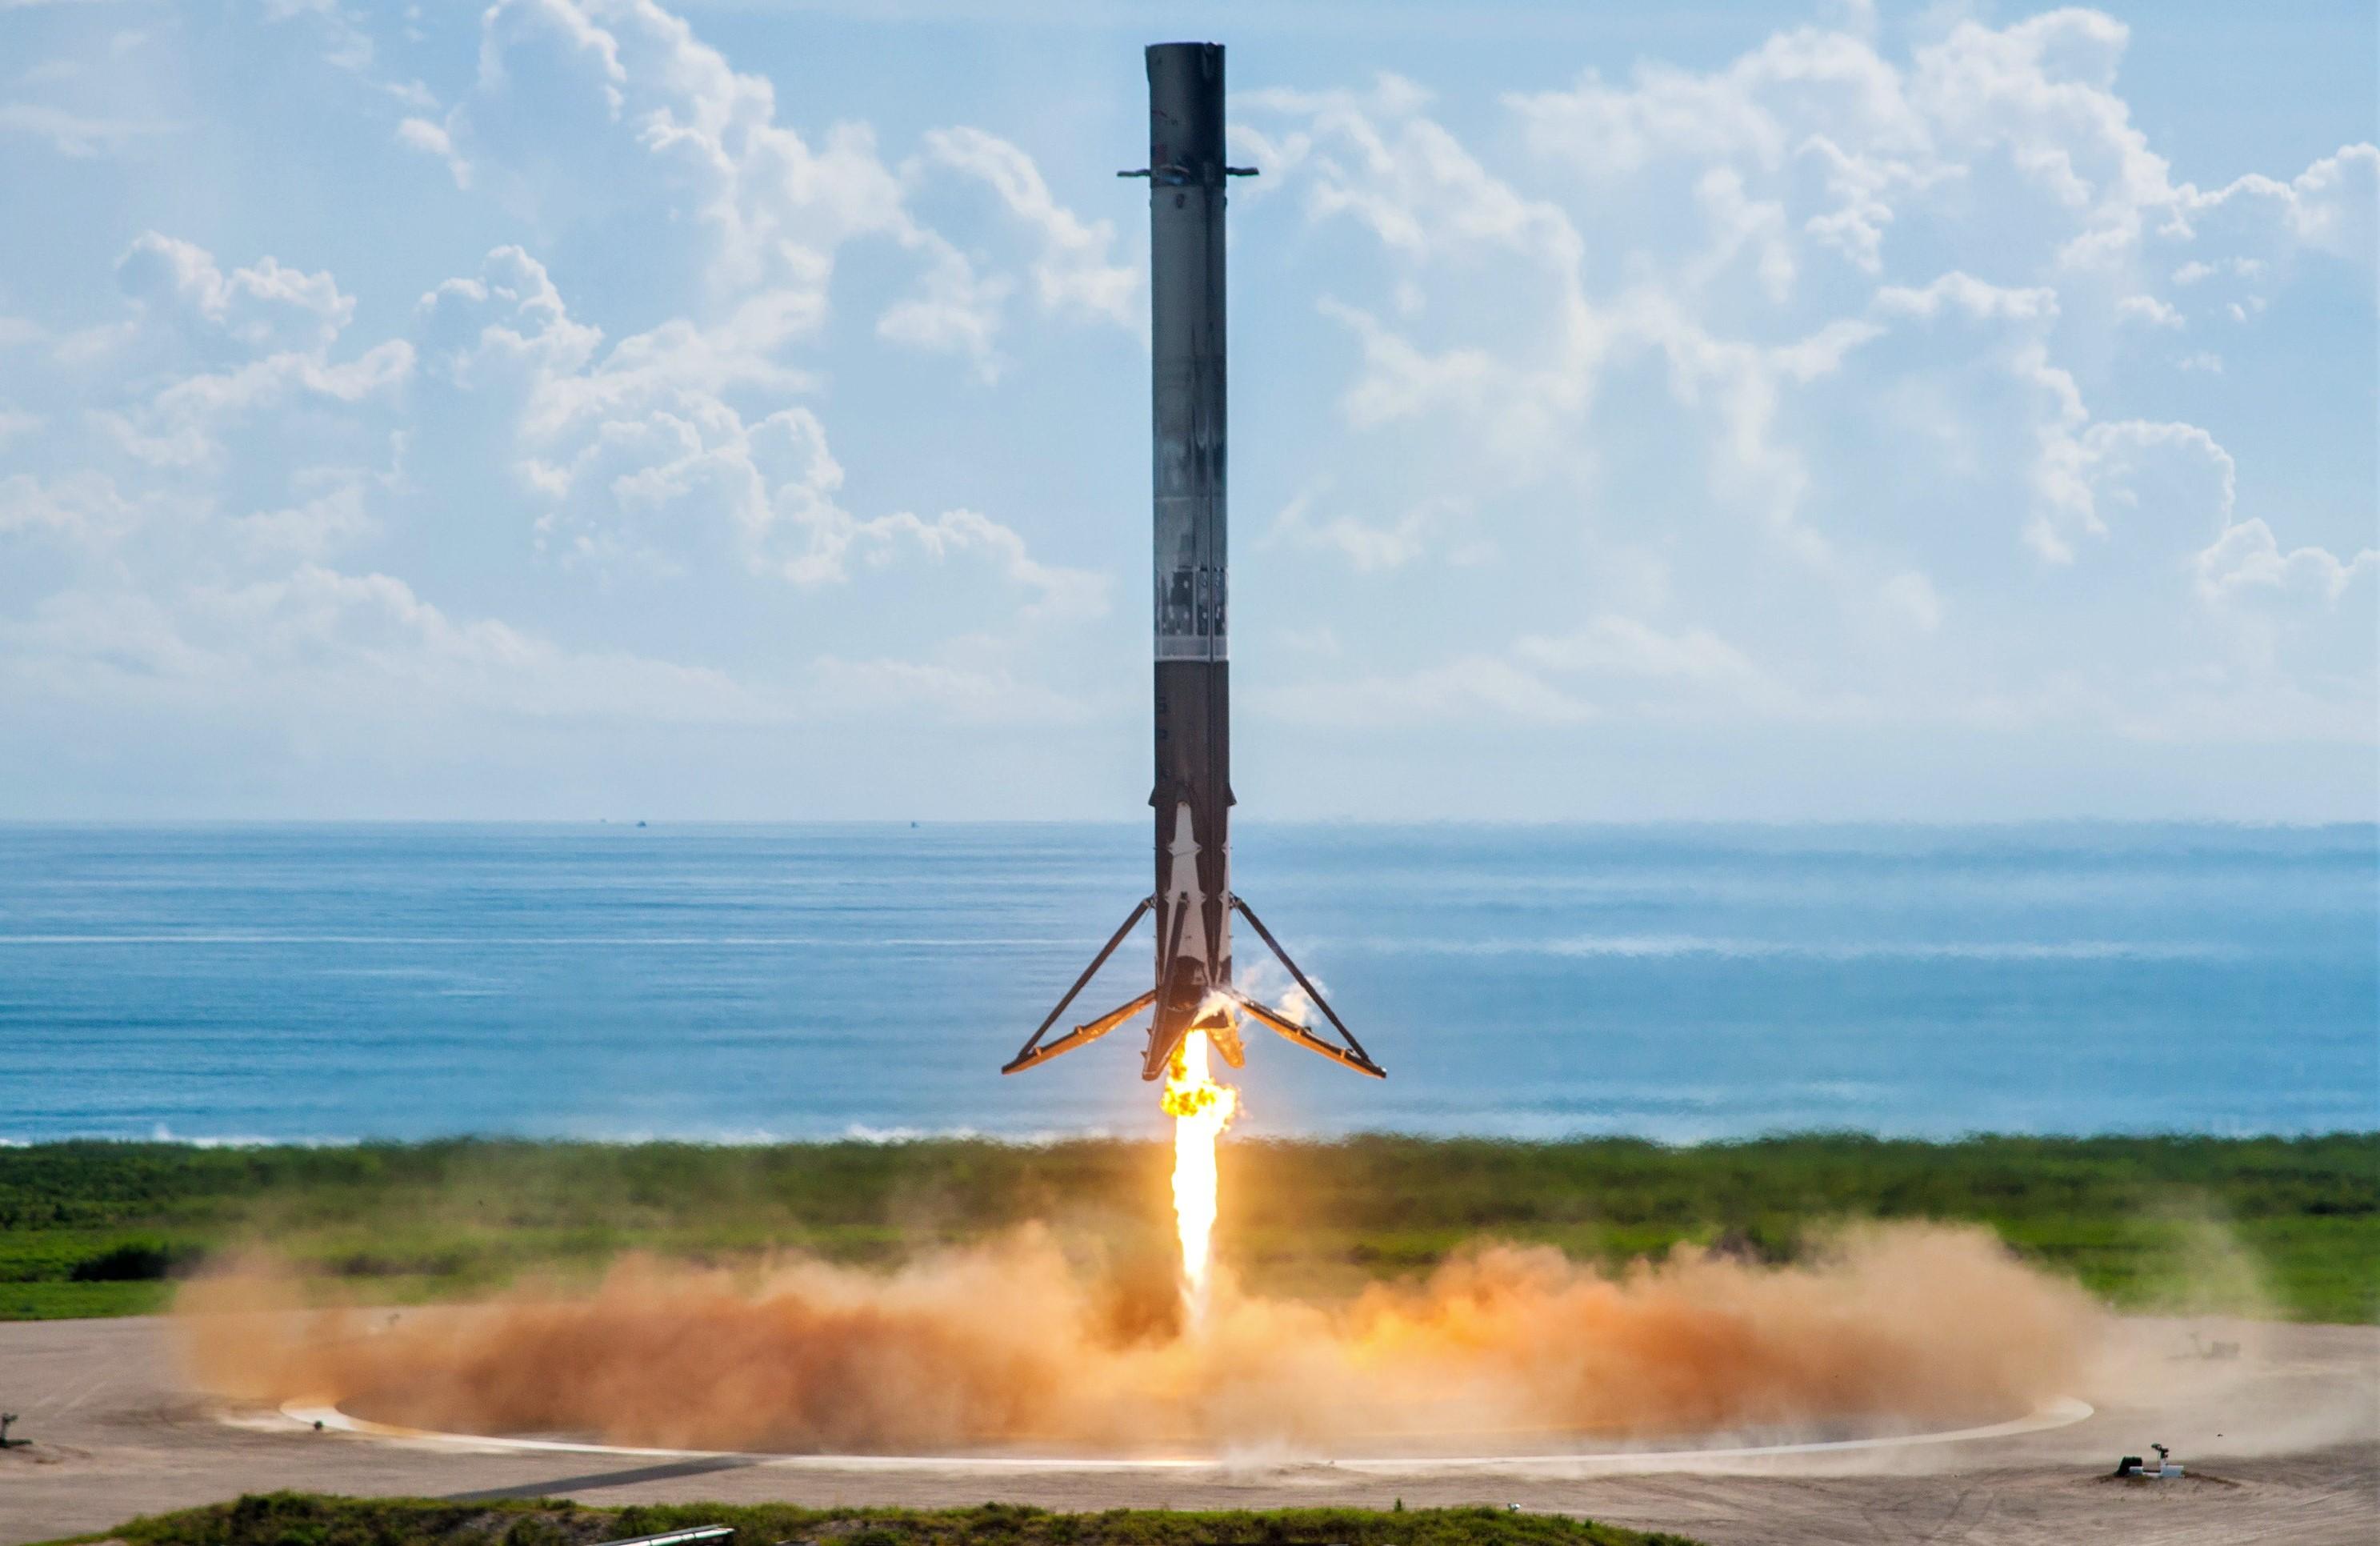 Falcon 9 B1040 OTV-5 LZ-1 landing Sept 2017 (SpaceX) 1 full